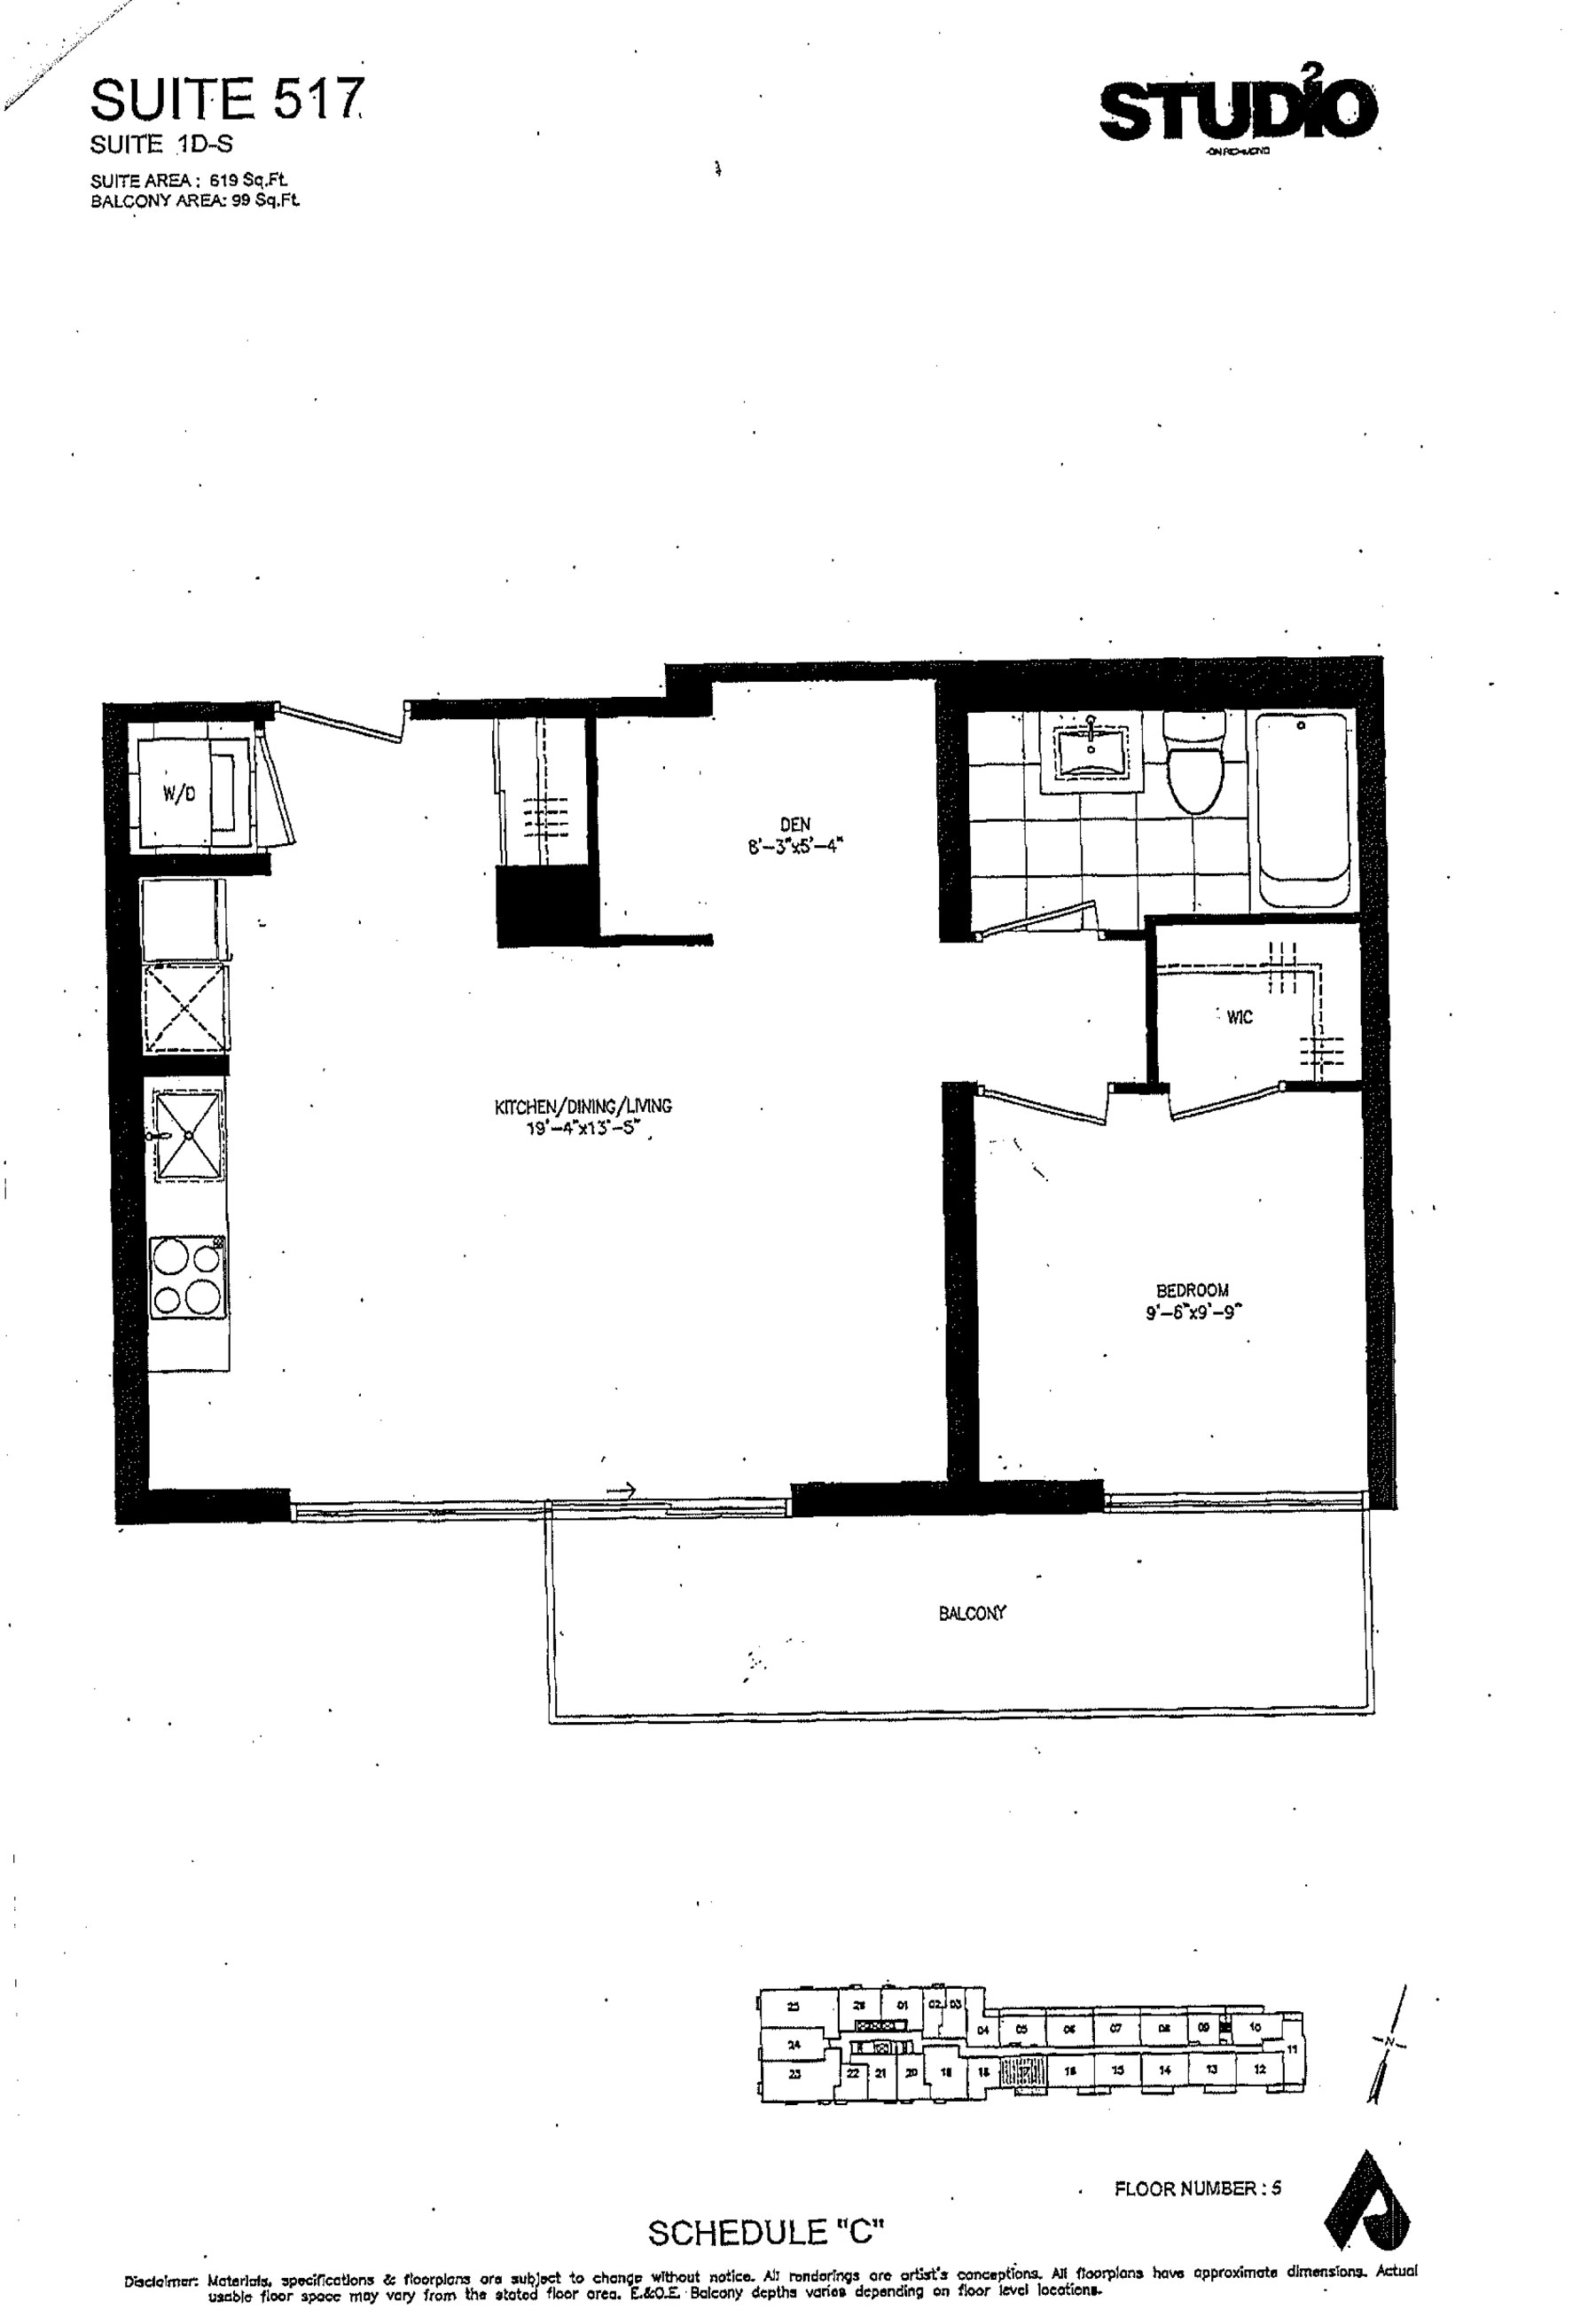 Studio2-floorplan-517